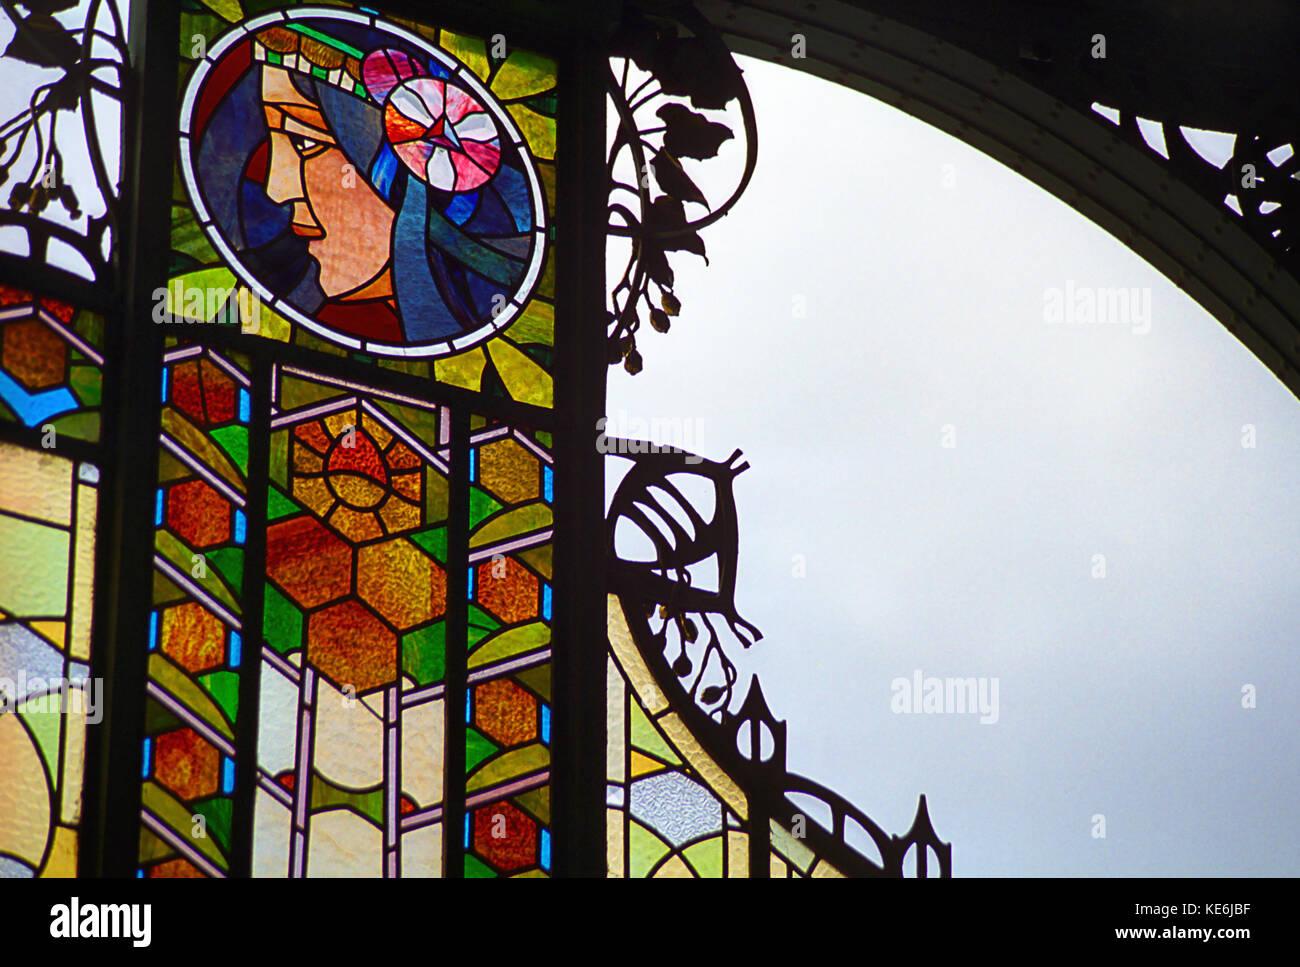 Art Nouveau stained glass by Alfons Mucha over the entrance to the Municipal House (Obecní dům), Prague, Czech Republic Stock Photo